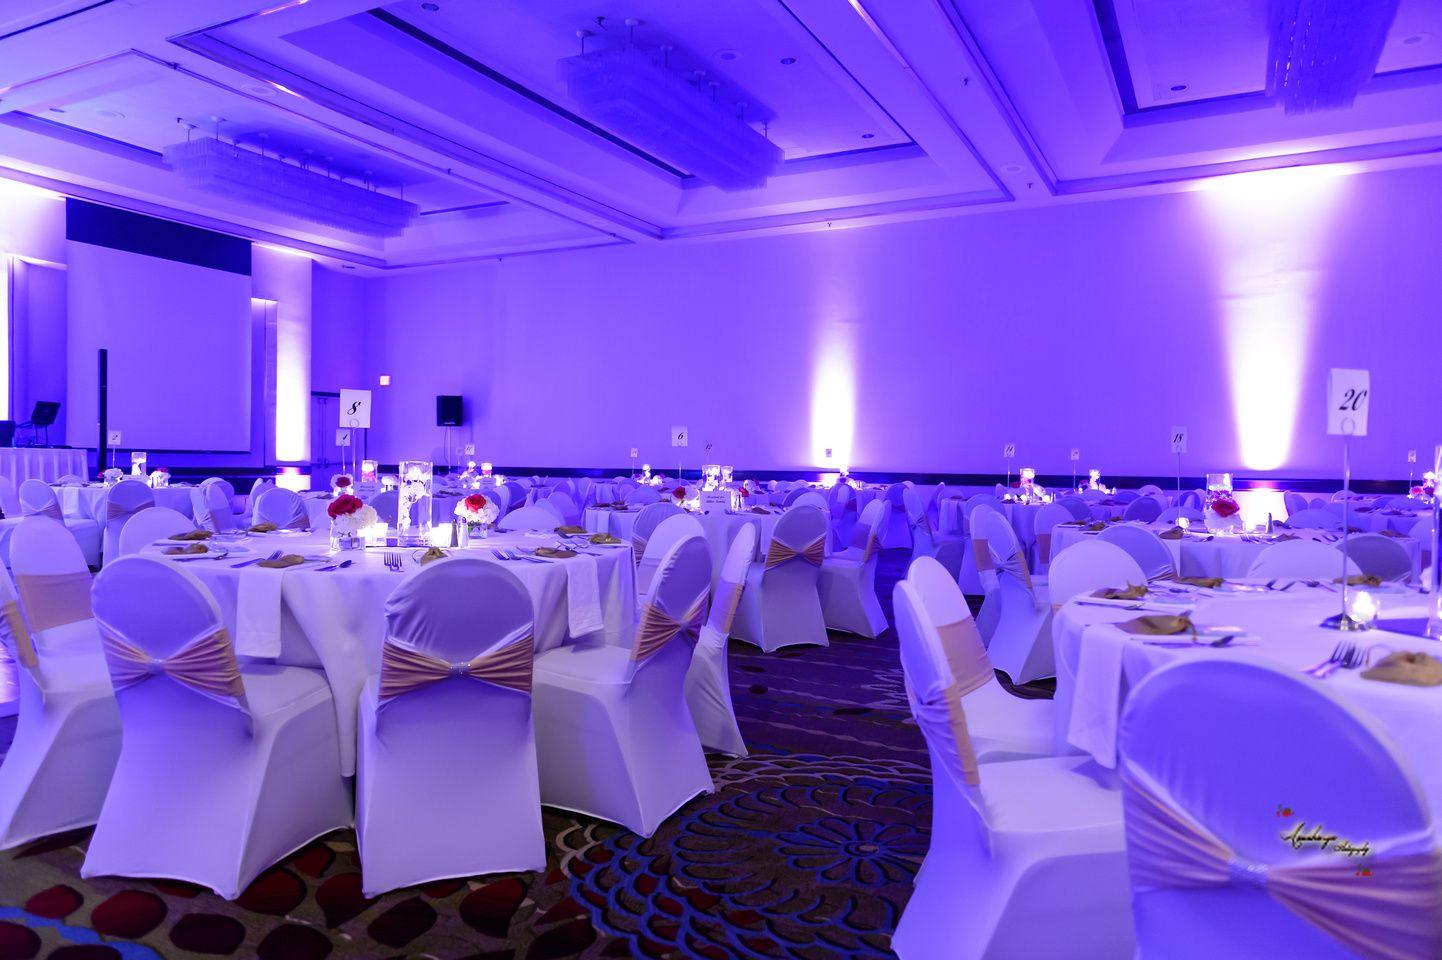 Indian Wedding Venue Decorations